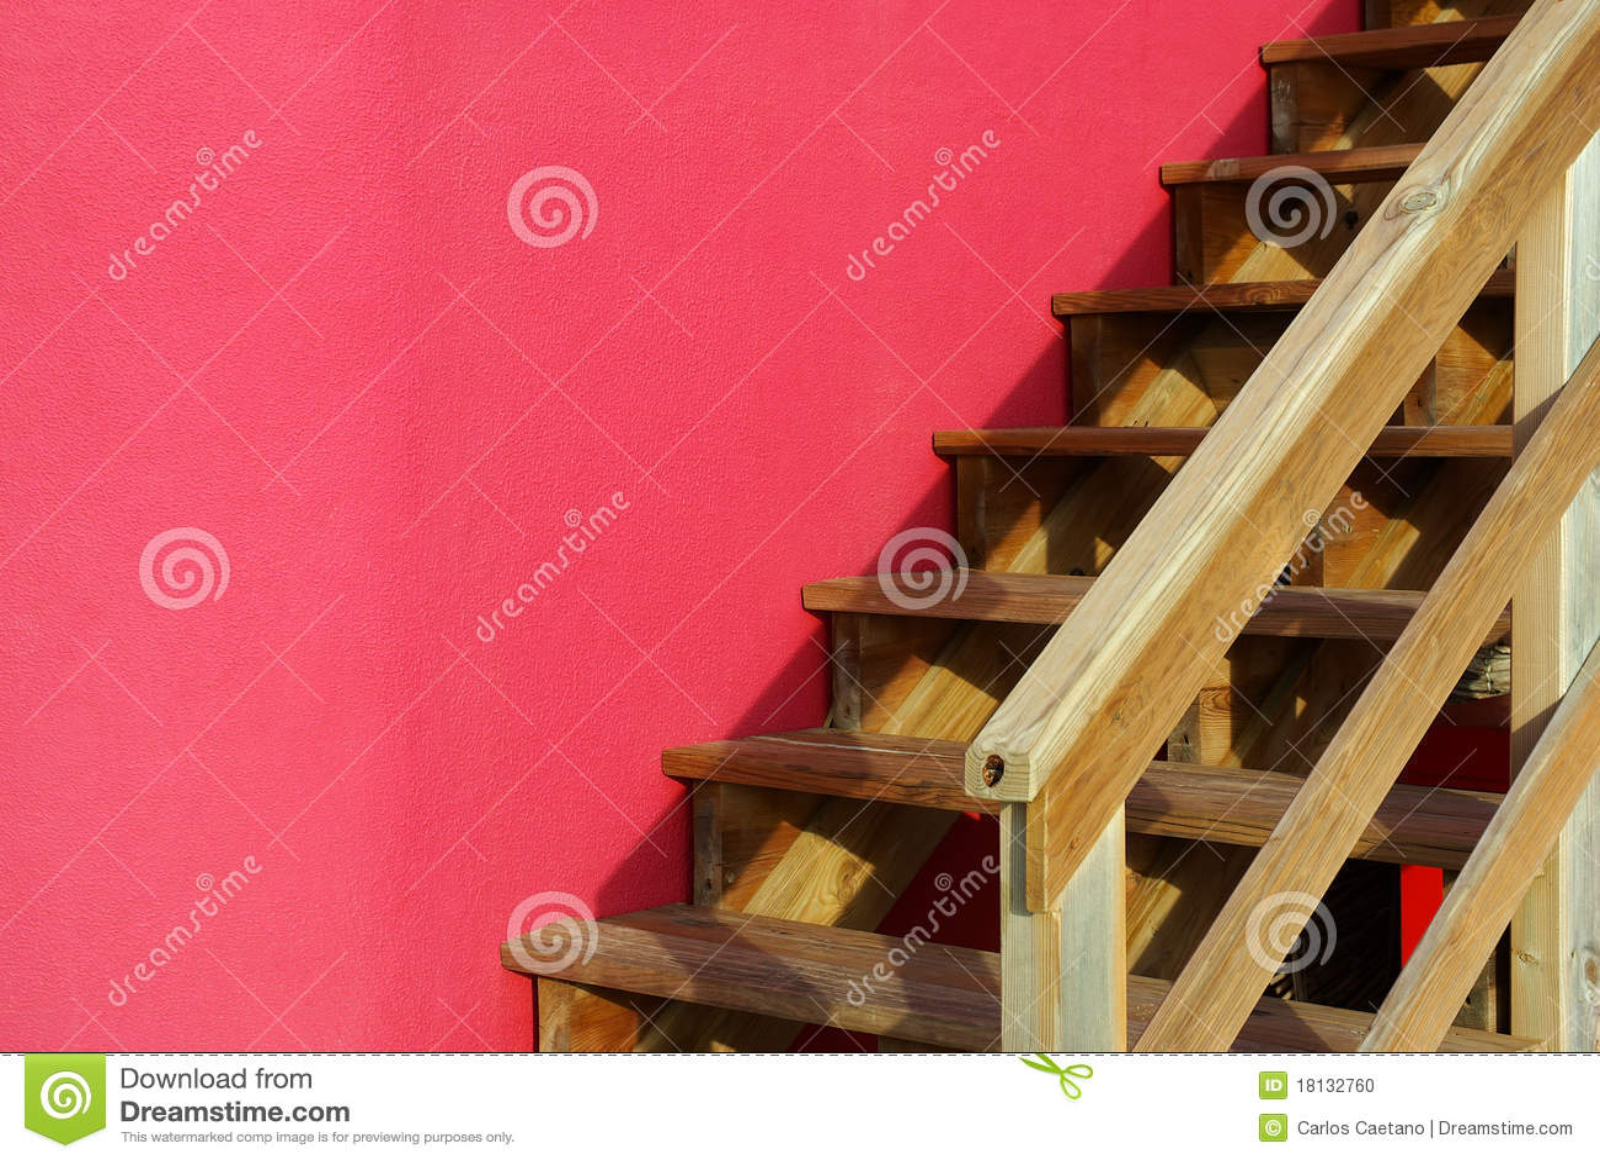 Escalera de madera foto de archivo imagen 18132760 - Escalera madera exterior ...